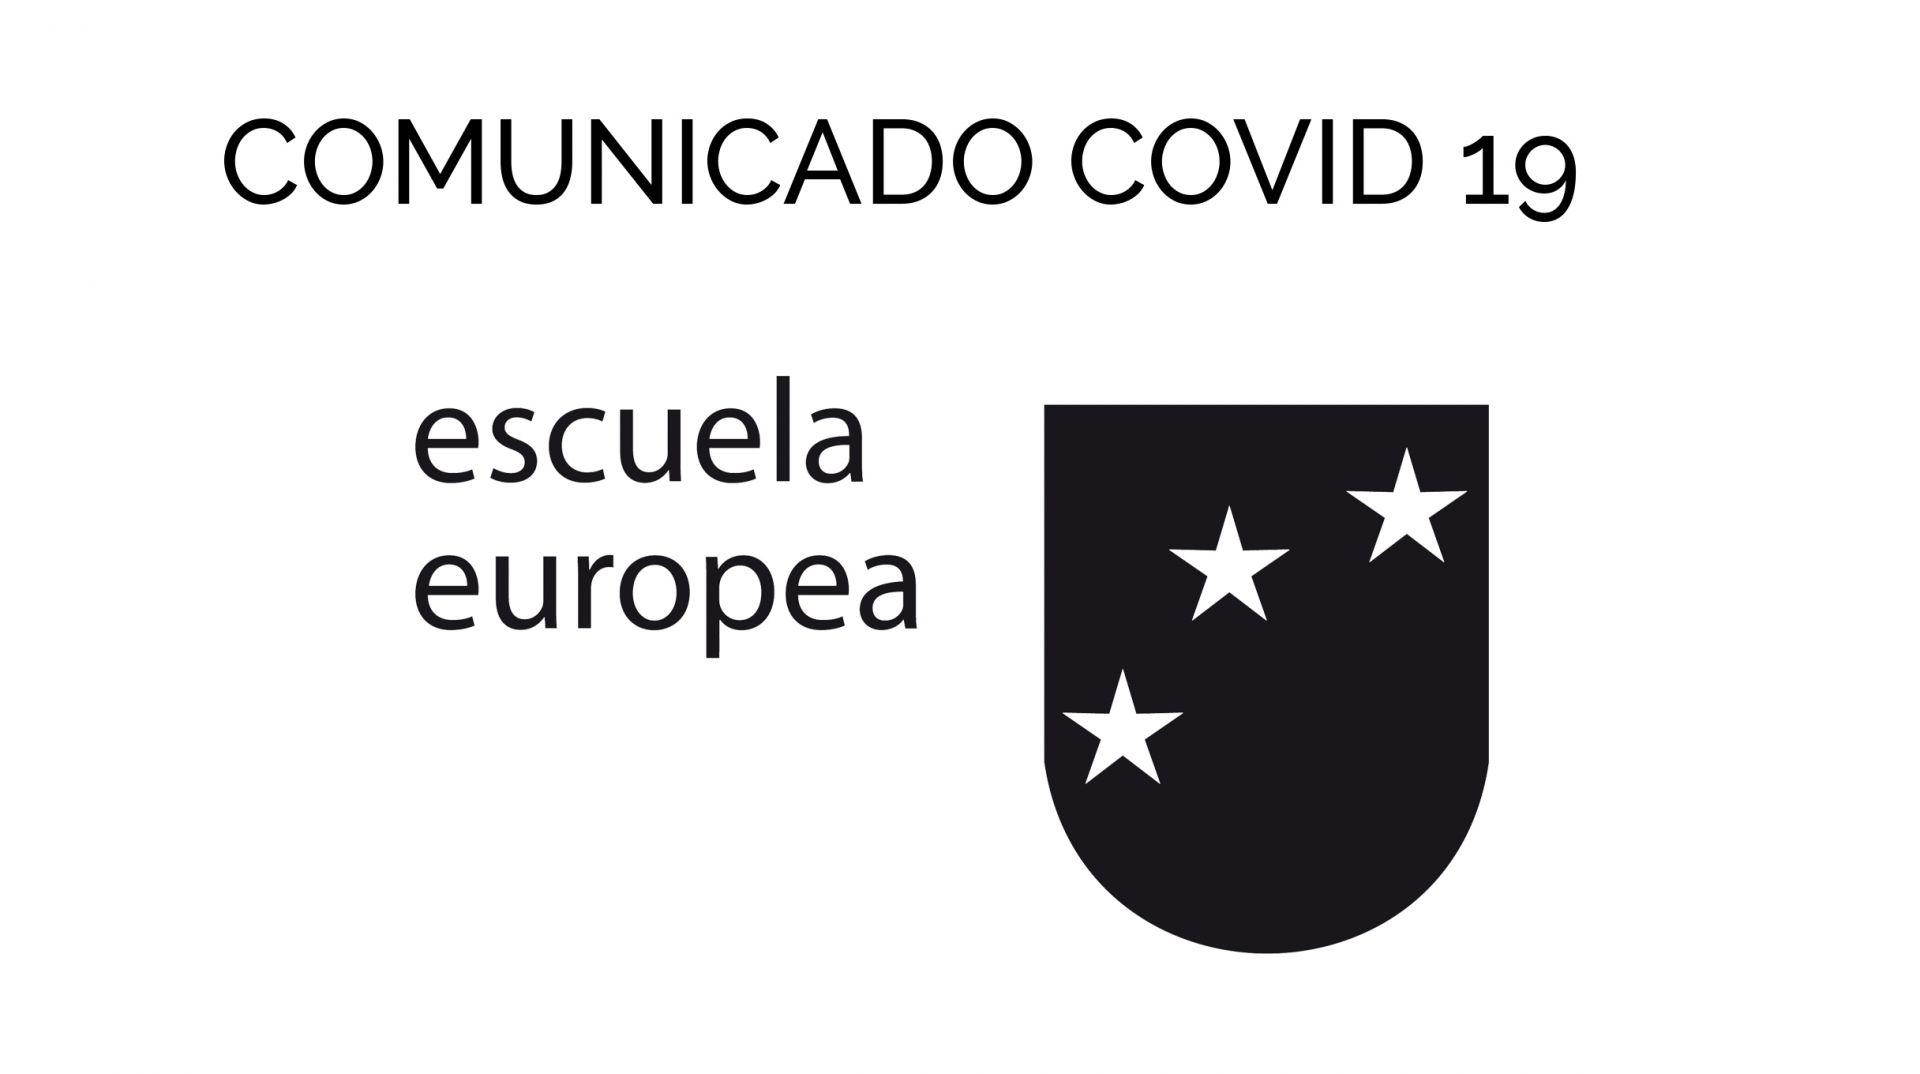 comunicado COVID 19 ESCUELA EUROPEA